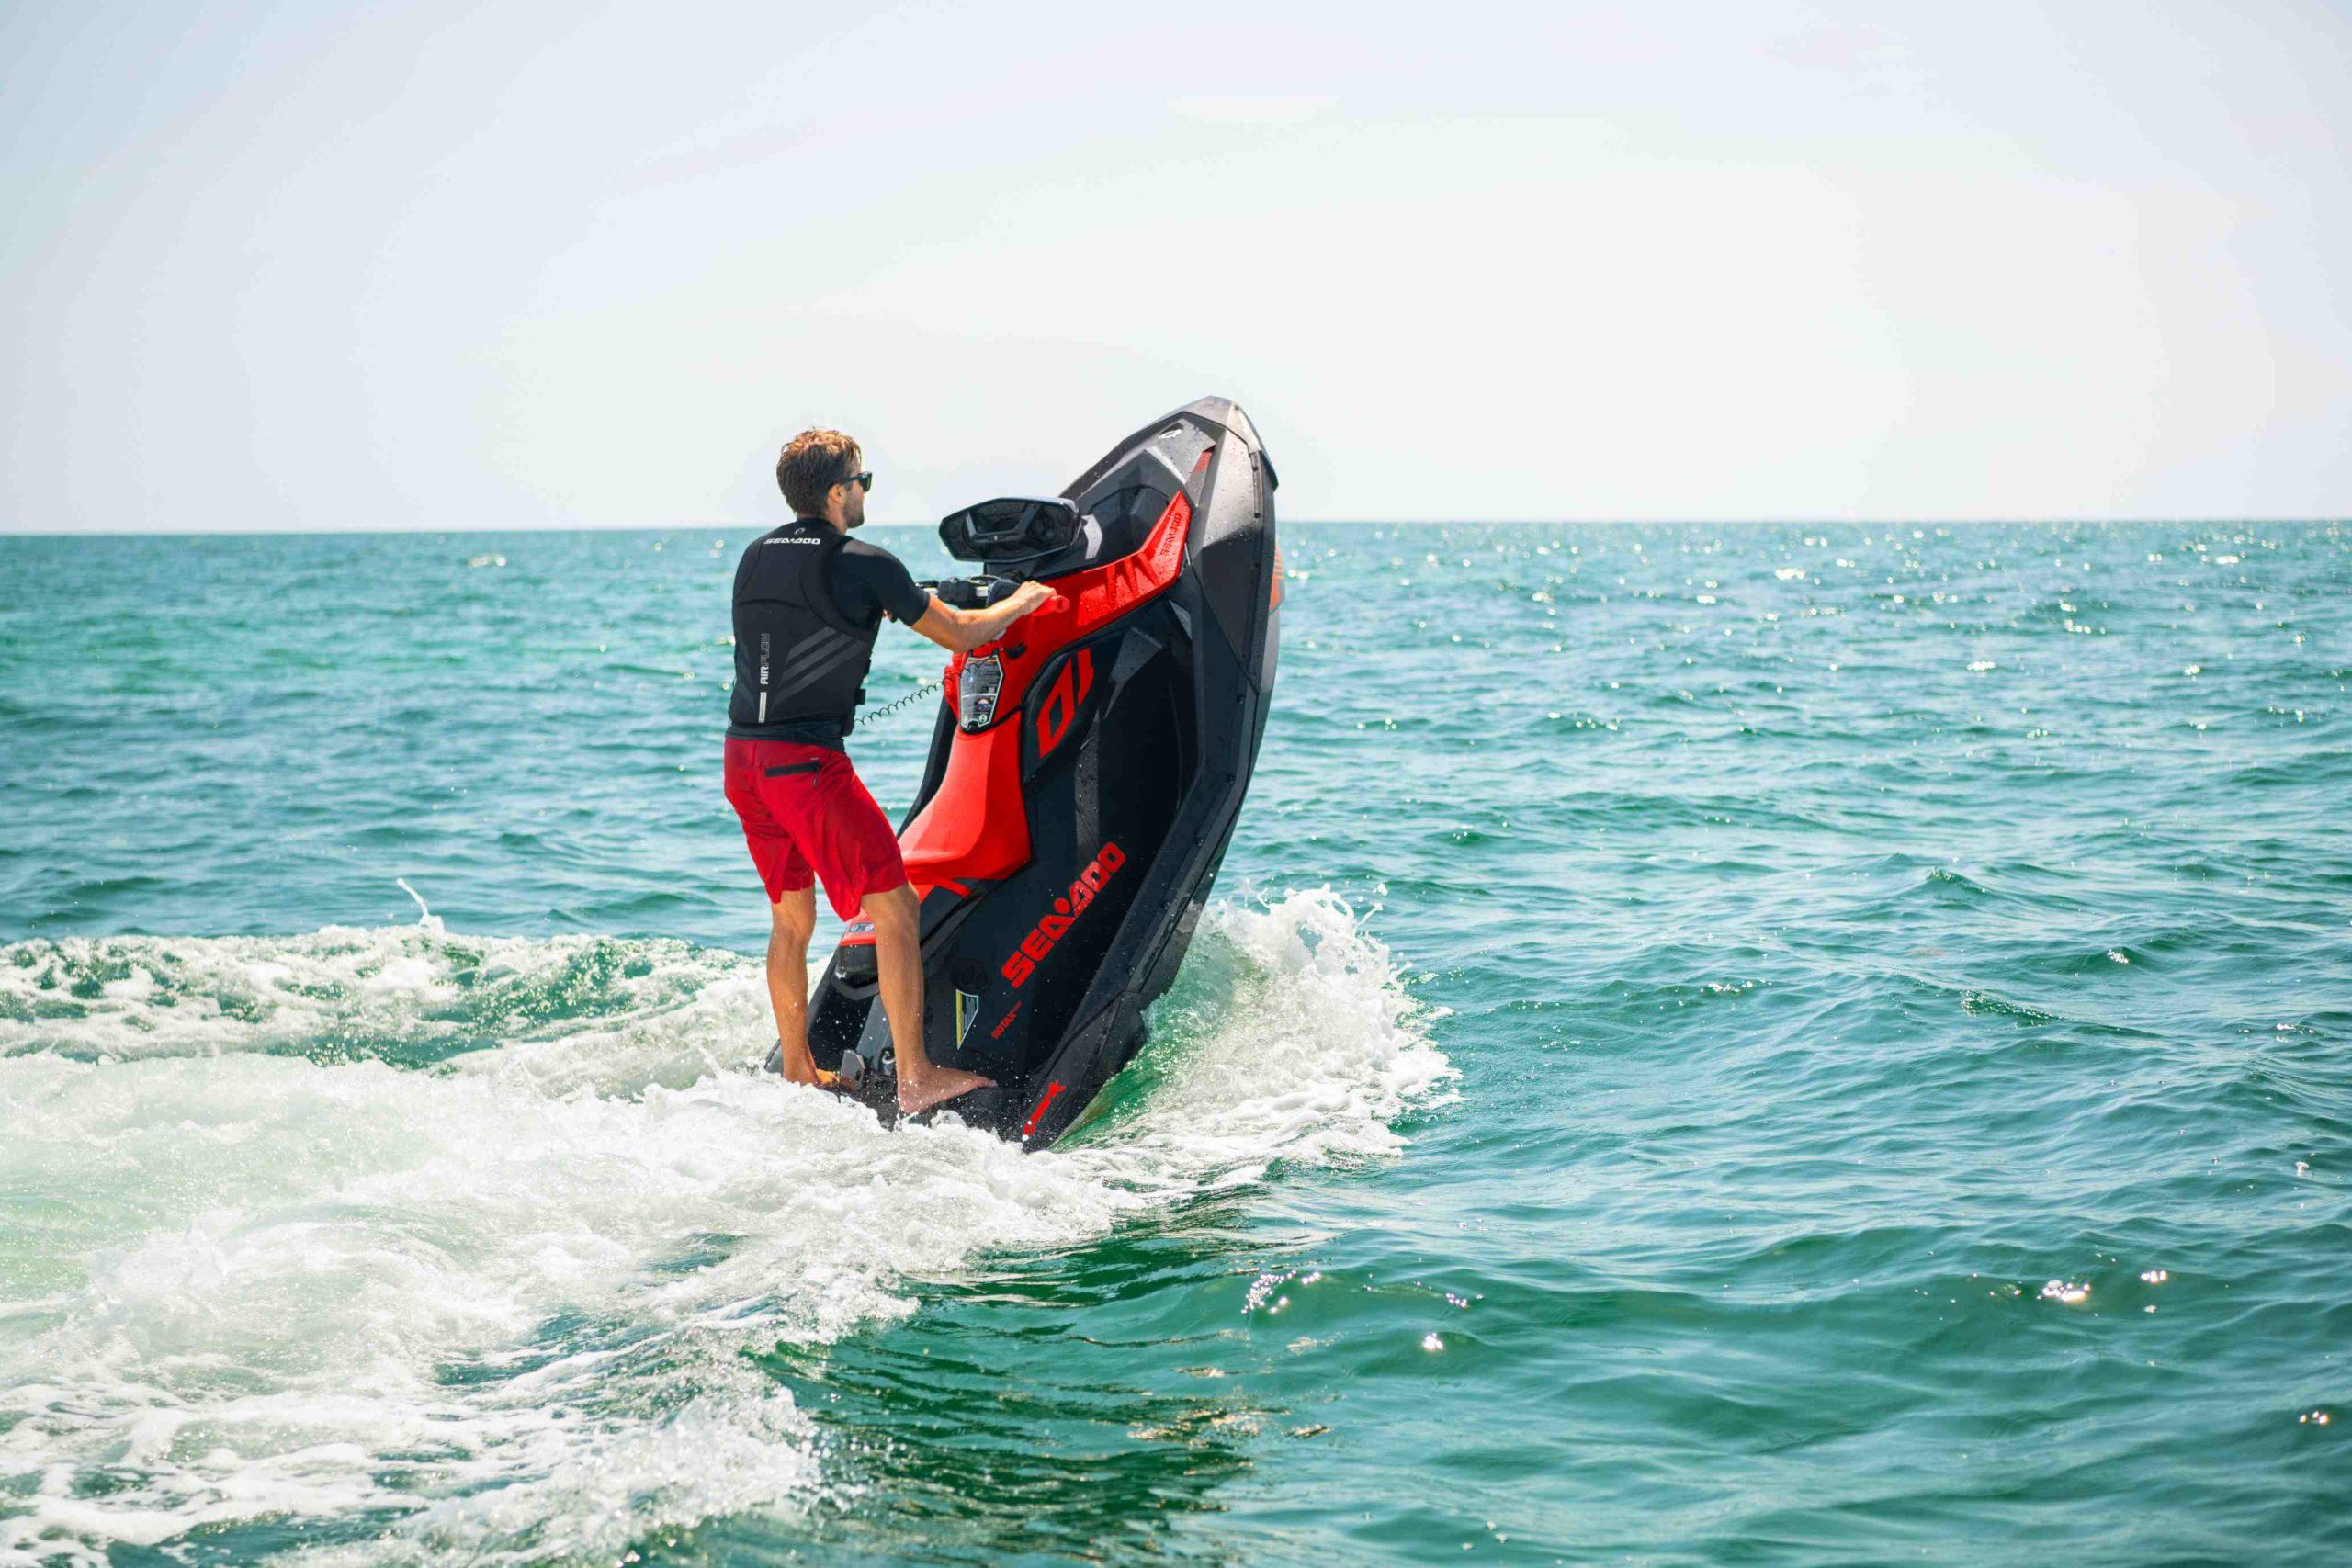 SEA-MY21-Spark-Trixx-action-DB-0489-RGB